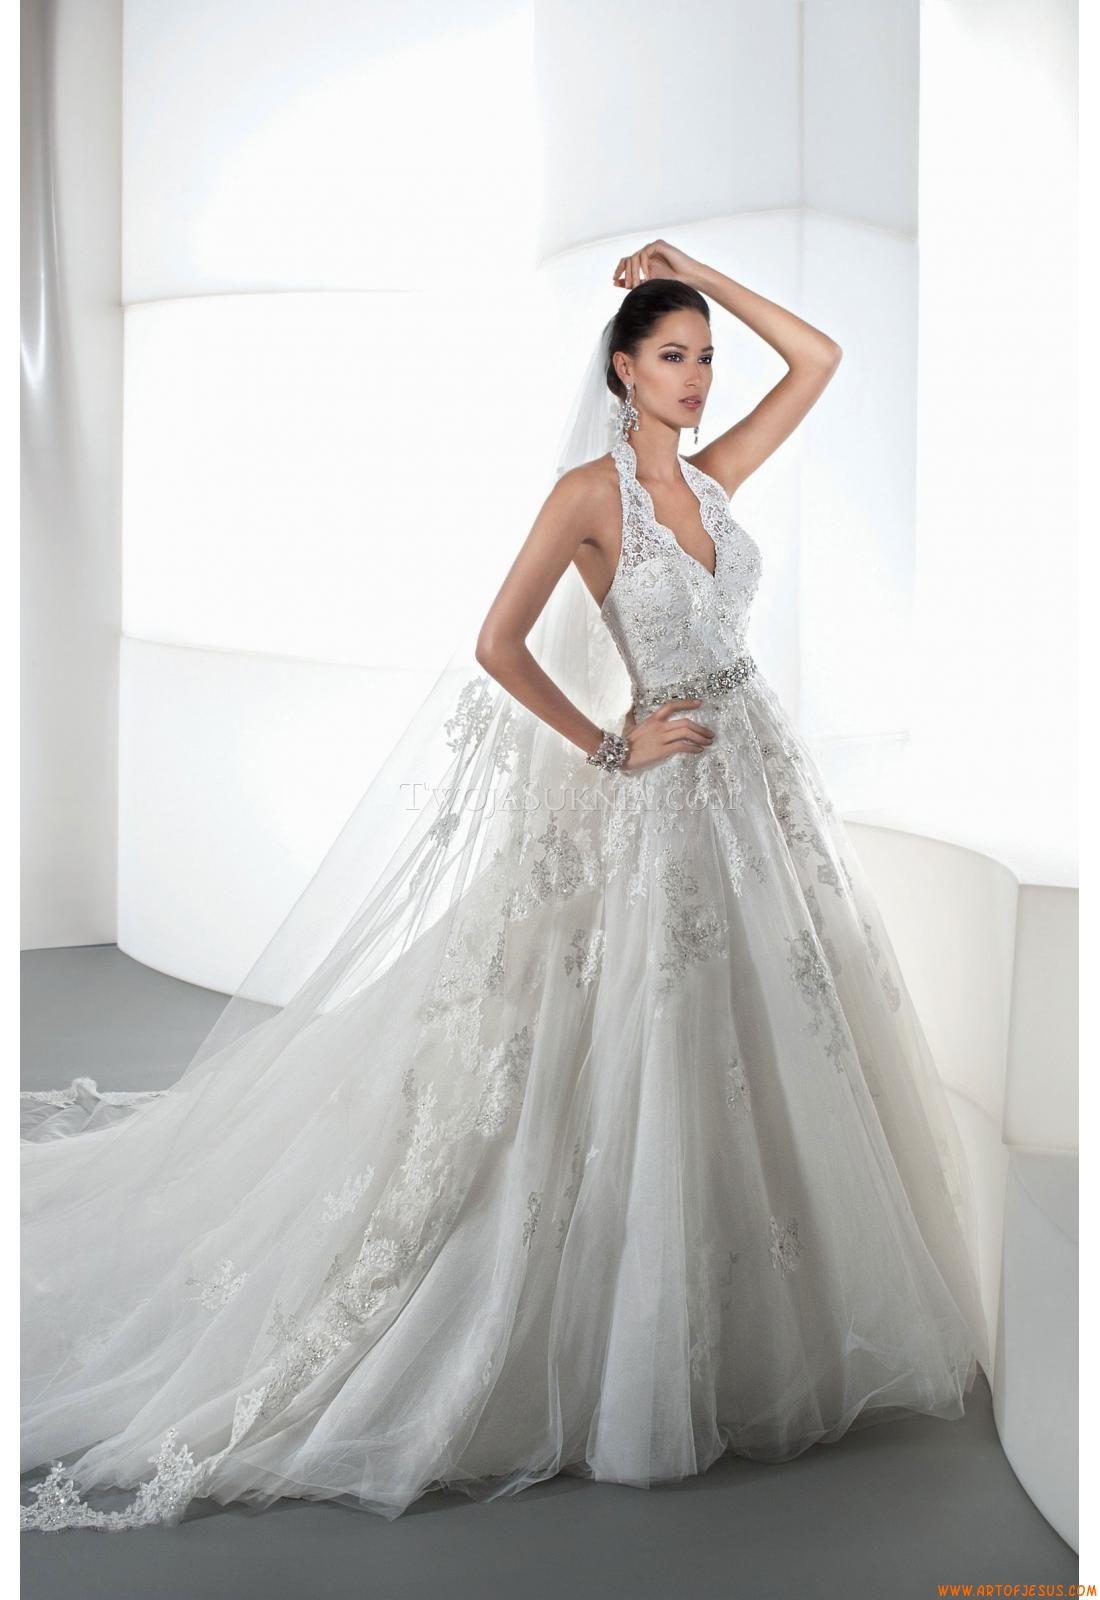 Wedding dress demetrios wedding dress demetrios